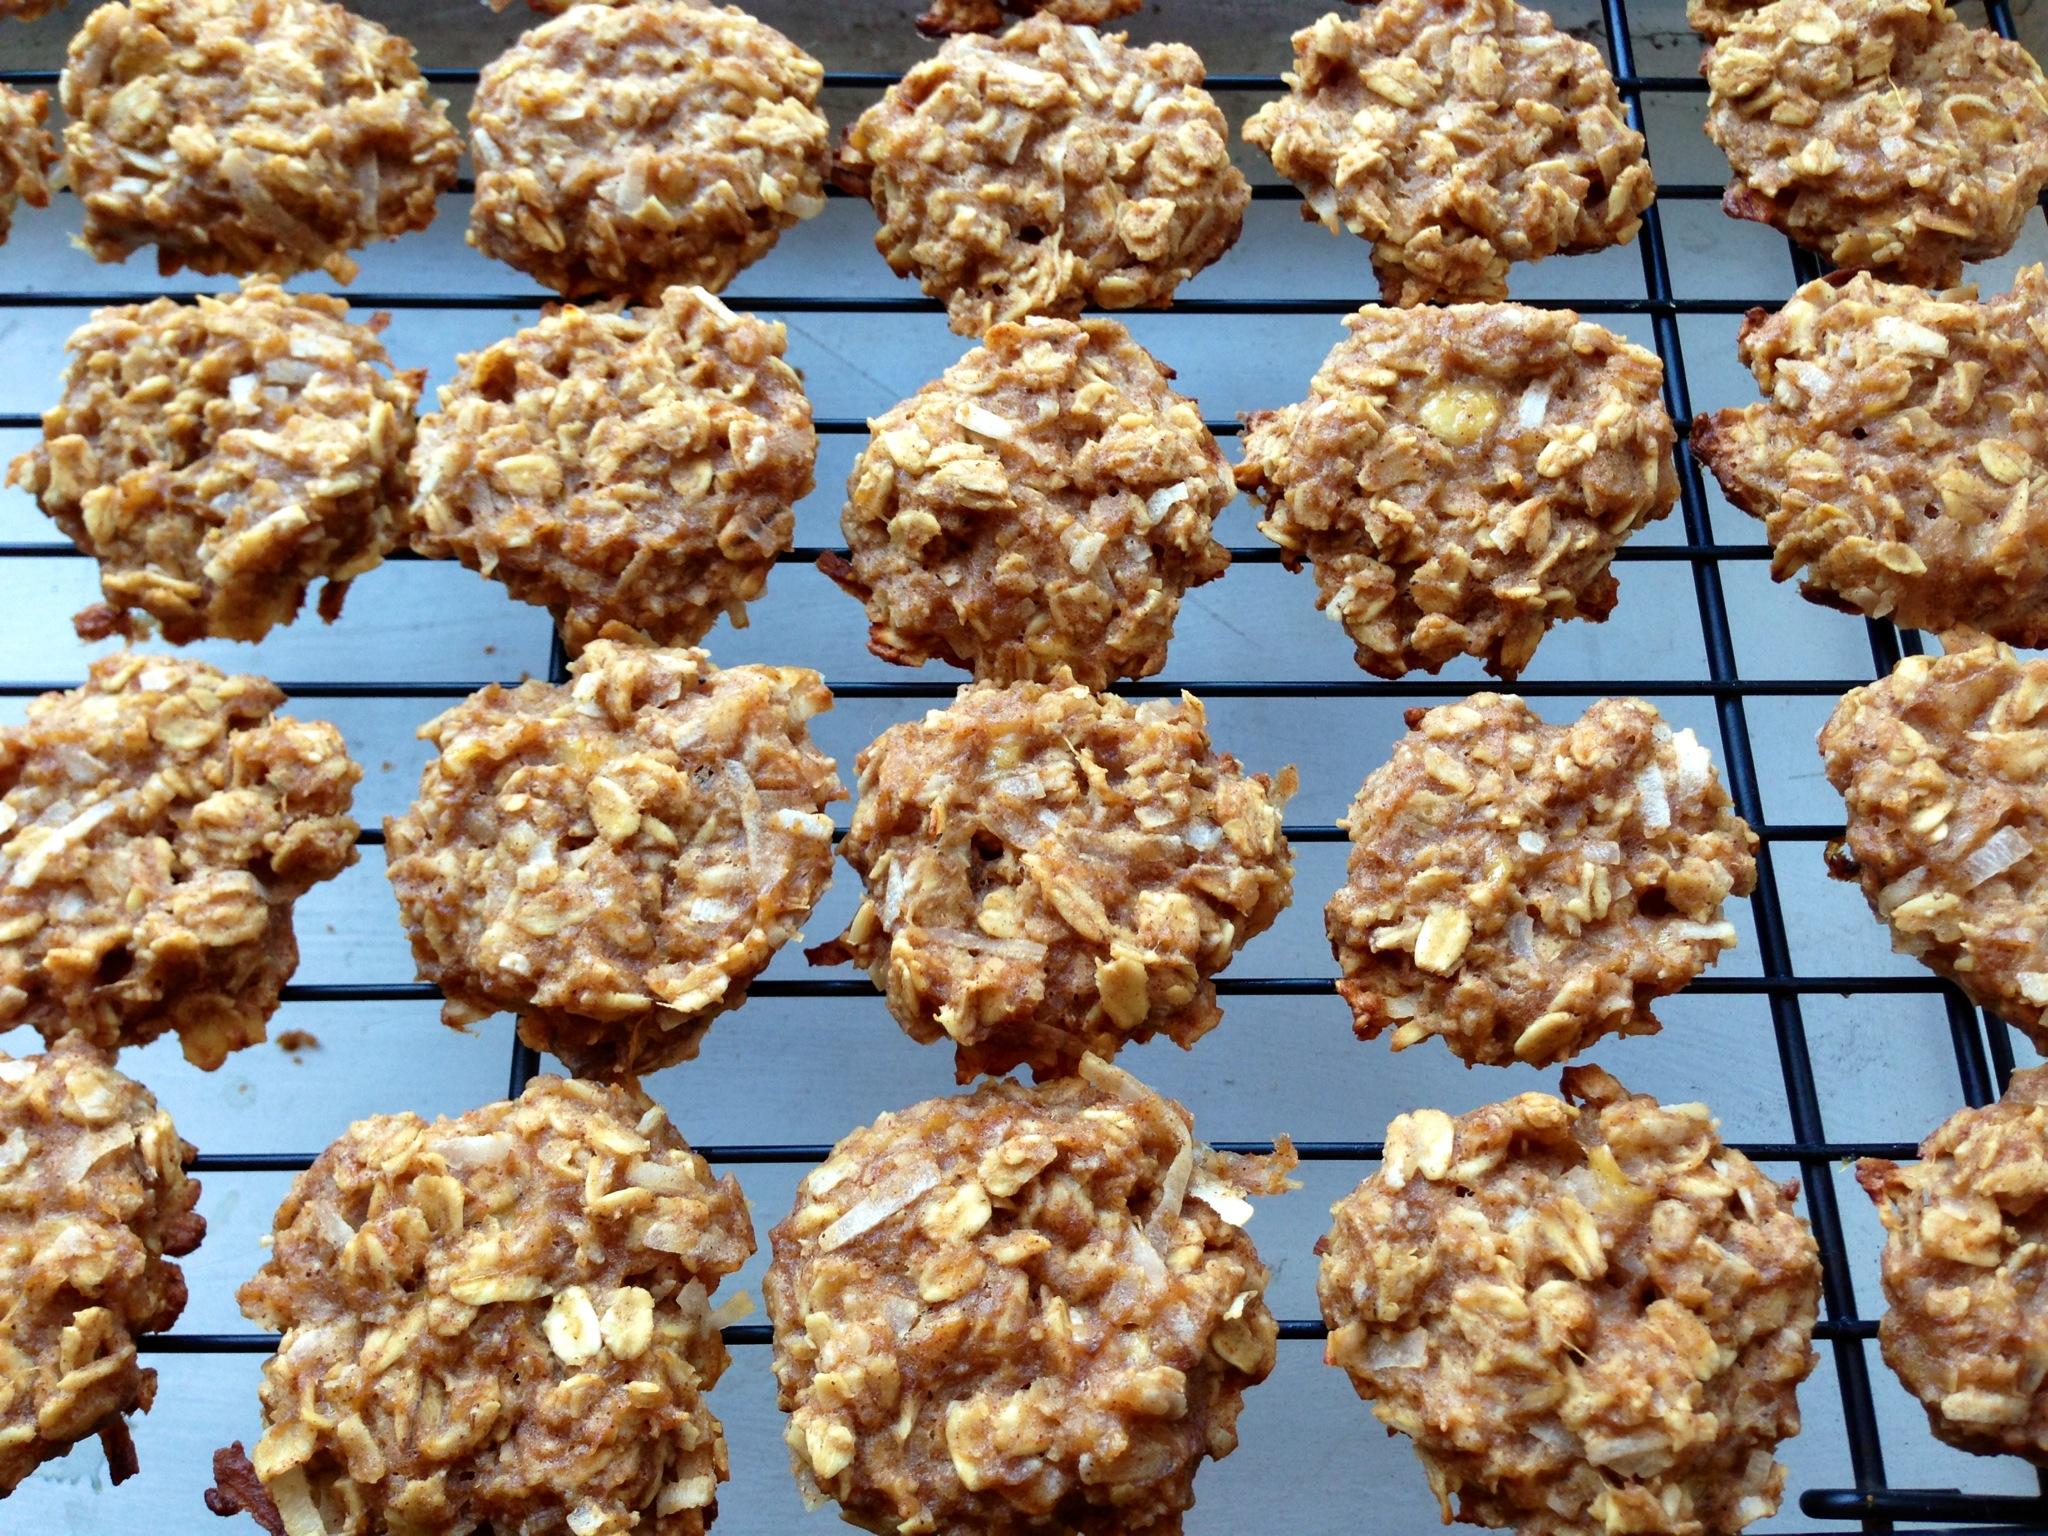 Healthy Peanut Butter Banana Oatmeal Cookies